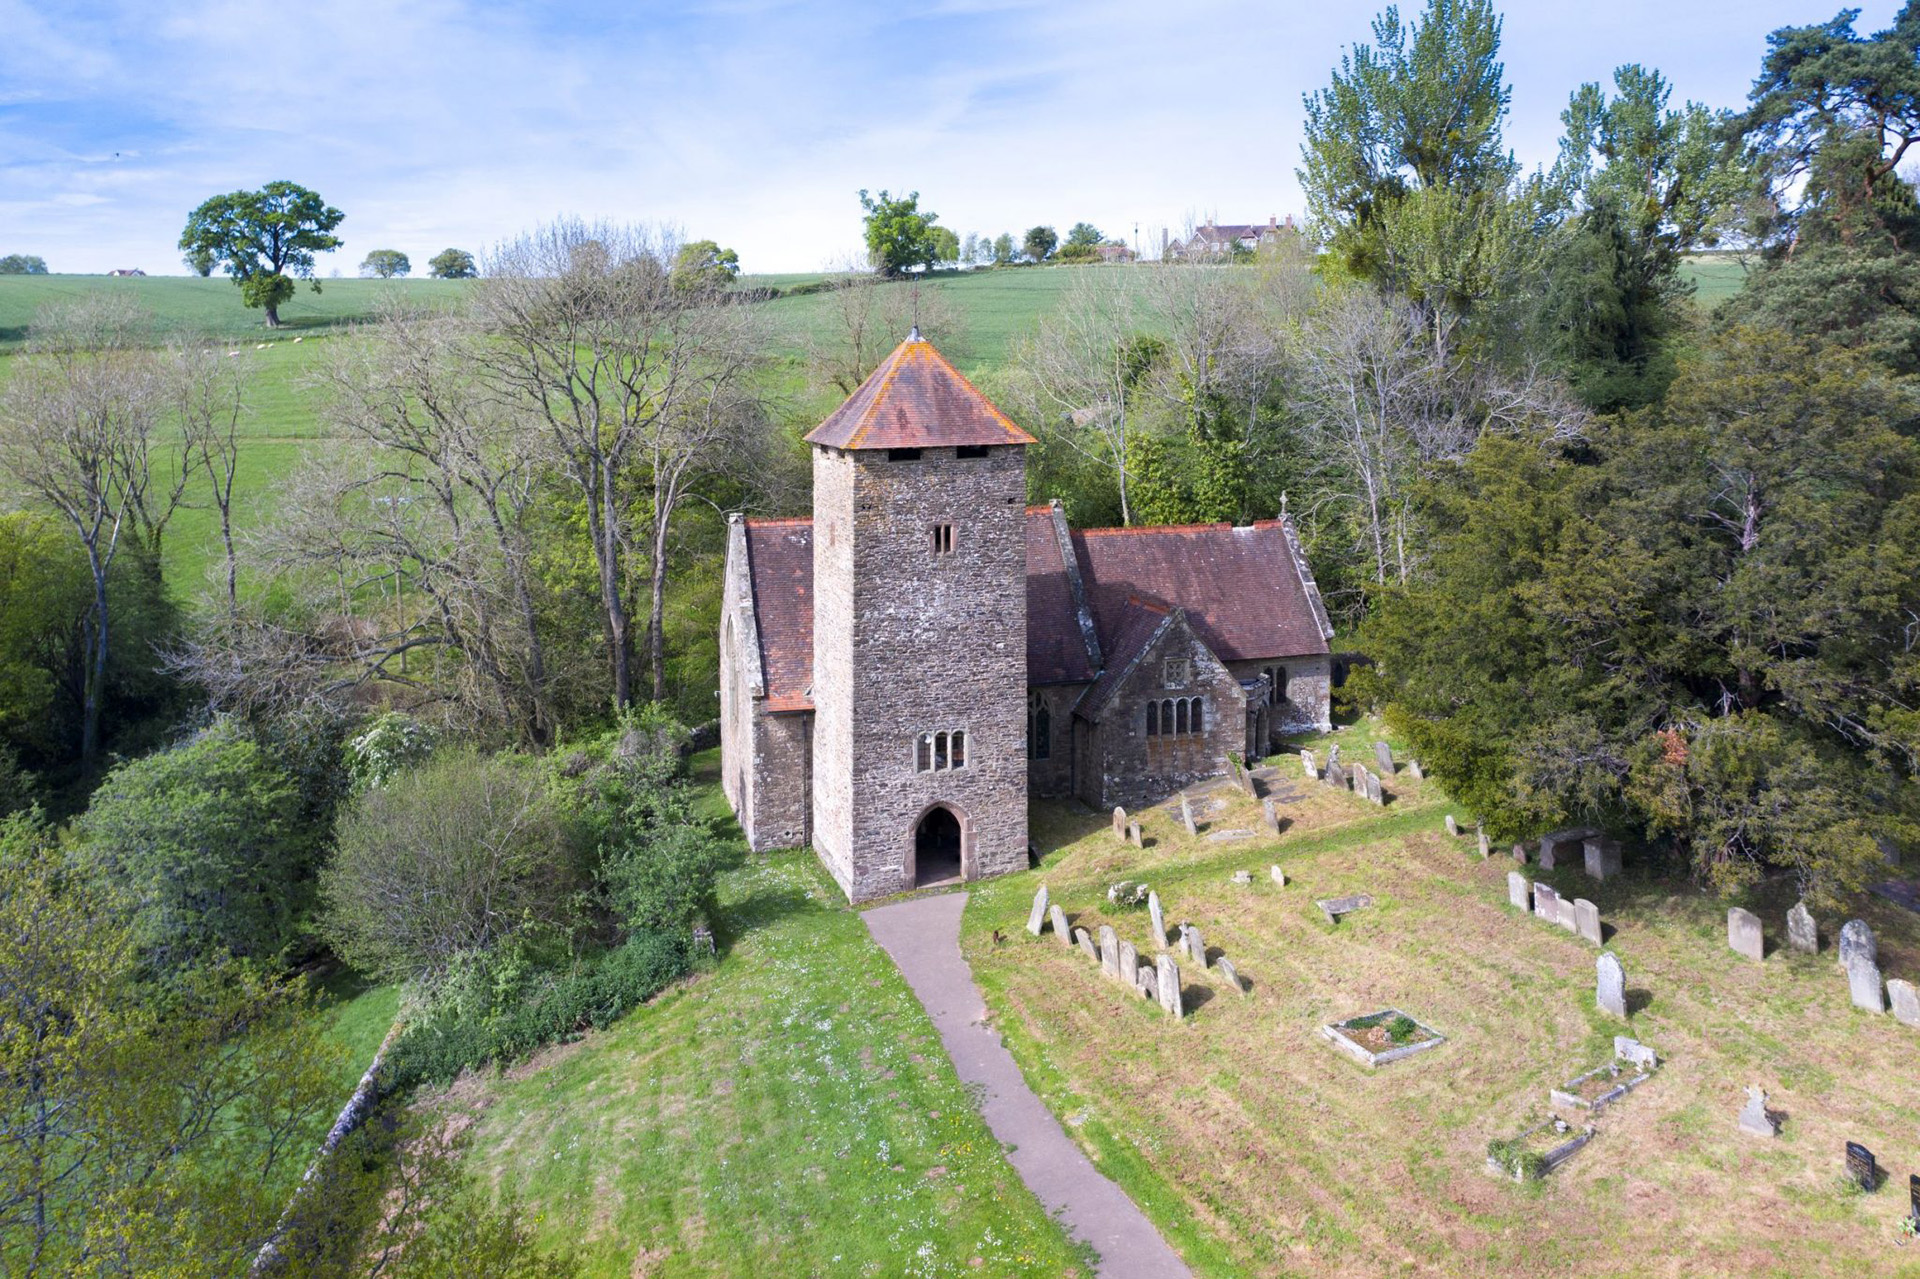 Llangatwg Feibion Afel: An Ancient Clas Church